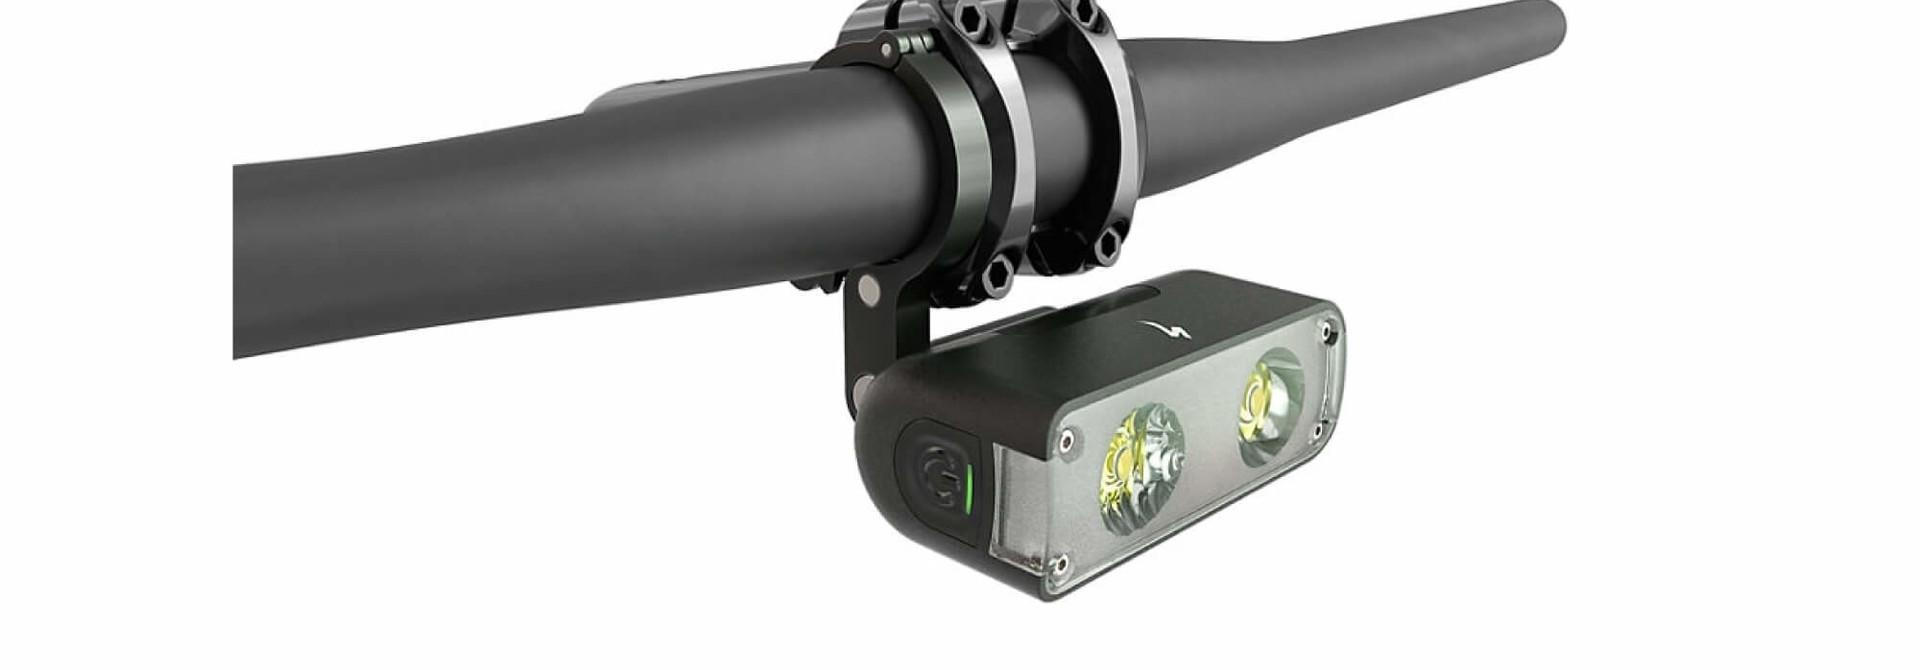 Flux 1250 Headlight